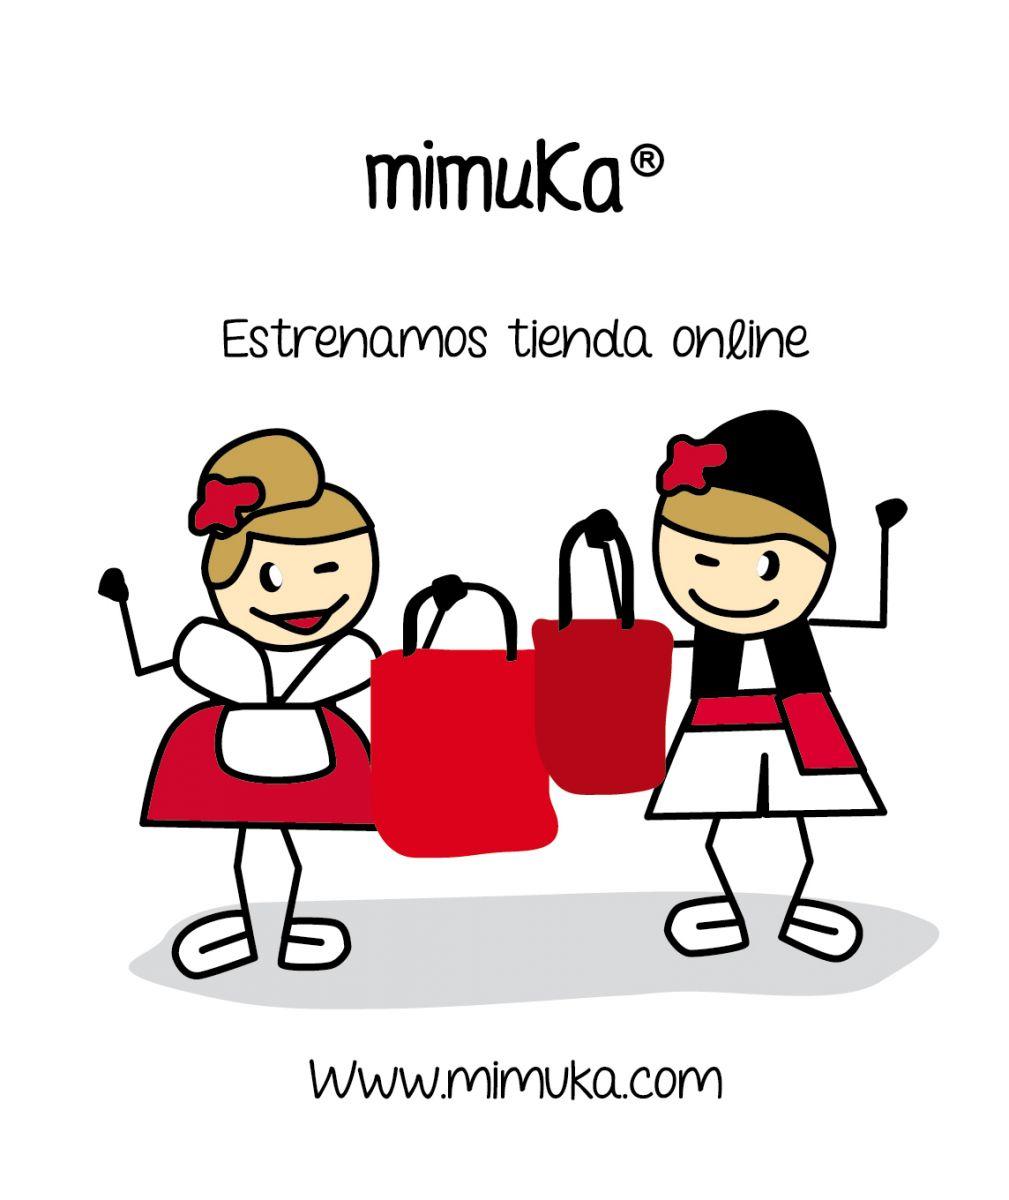 MIMUKA ya tiene  tienda ONLINE